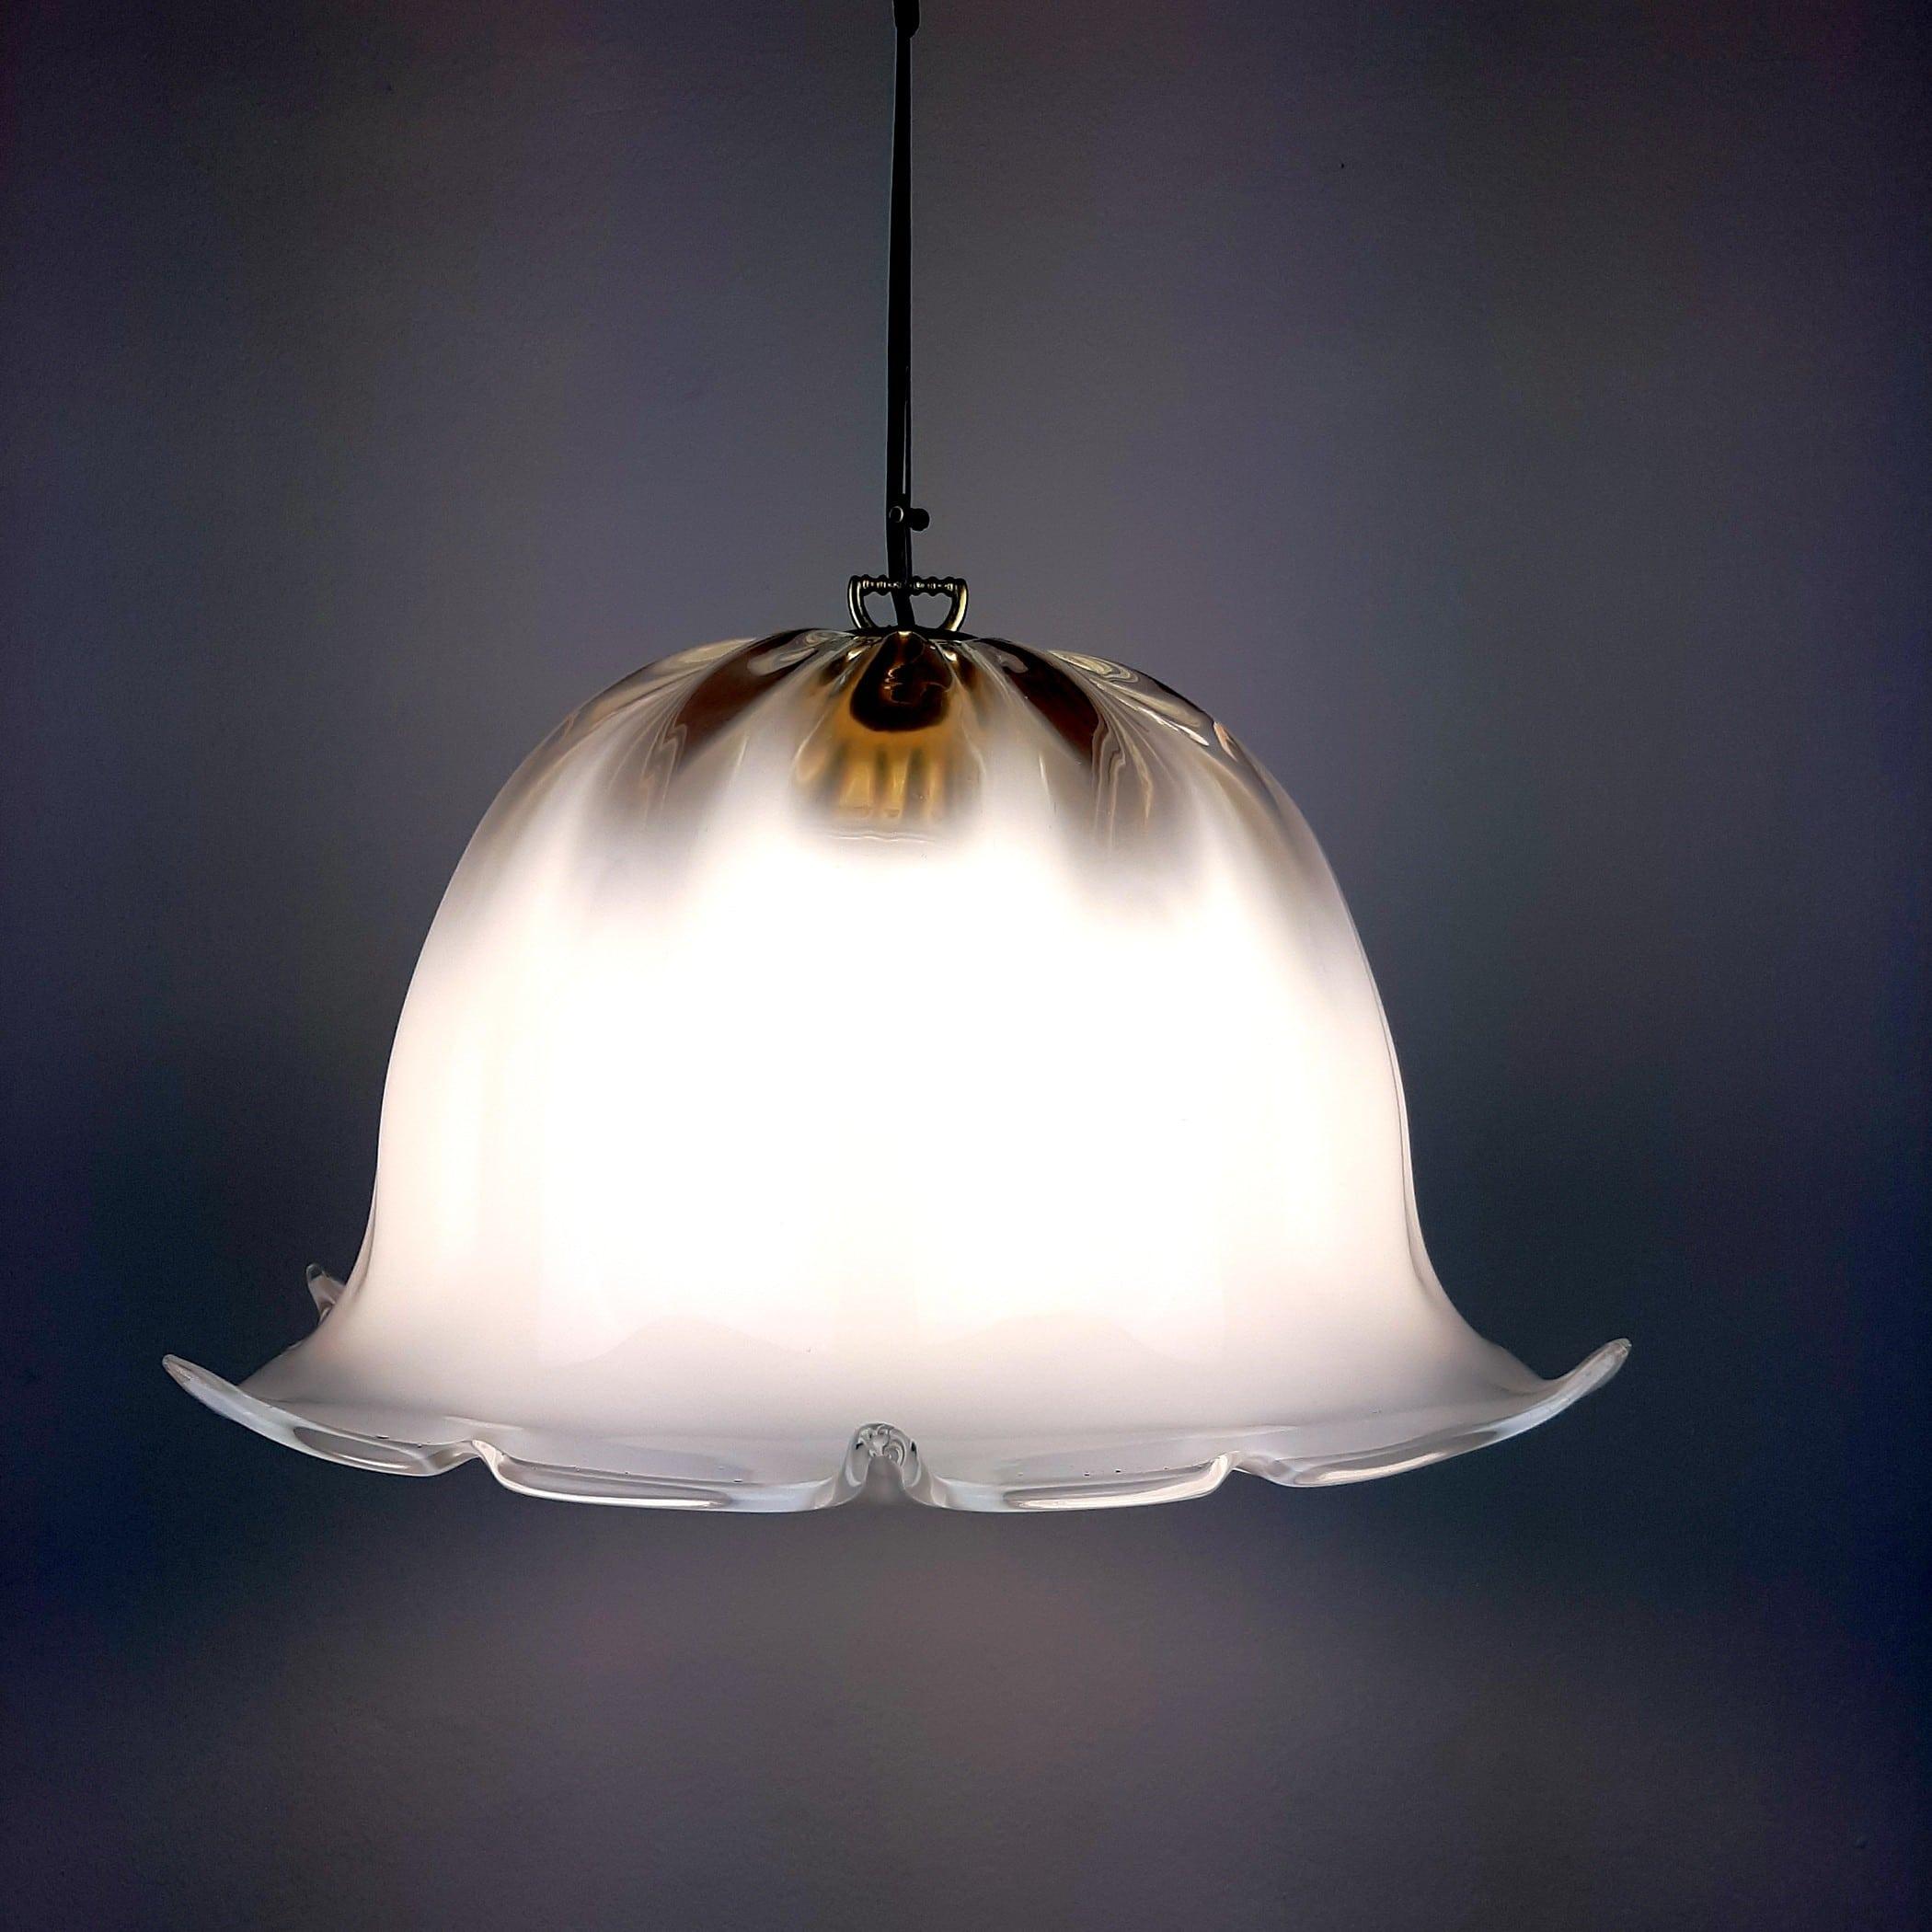 Vintage murano glass pendant lamp Italy 1970s Retro home decor Mid-century lighting